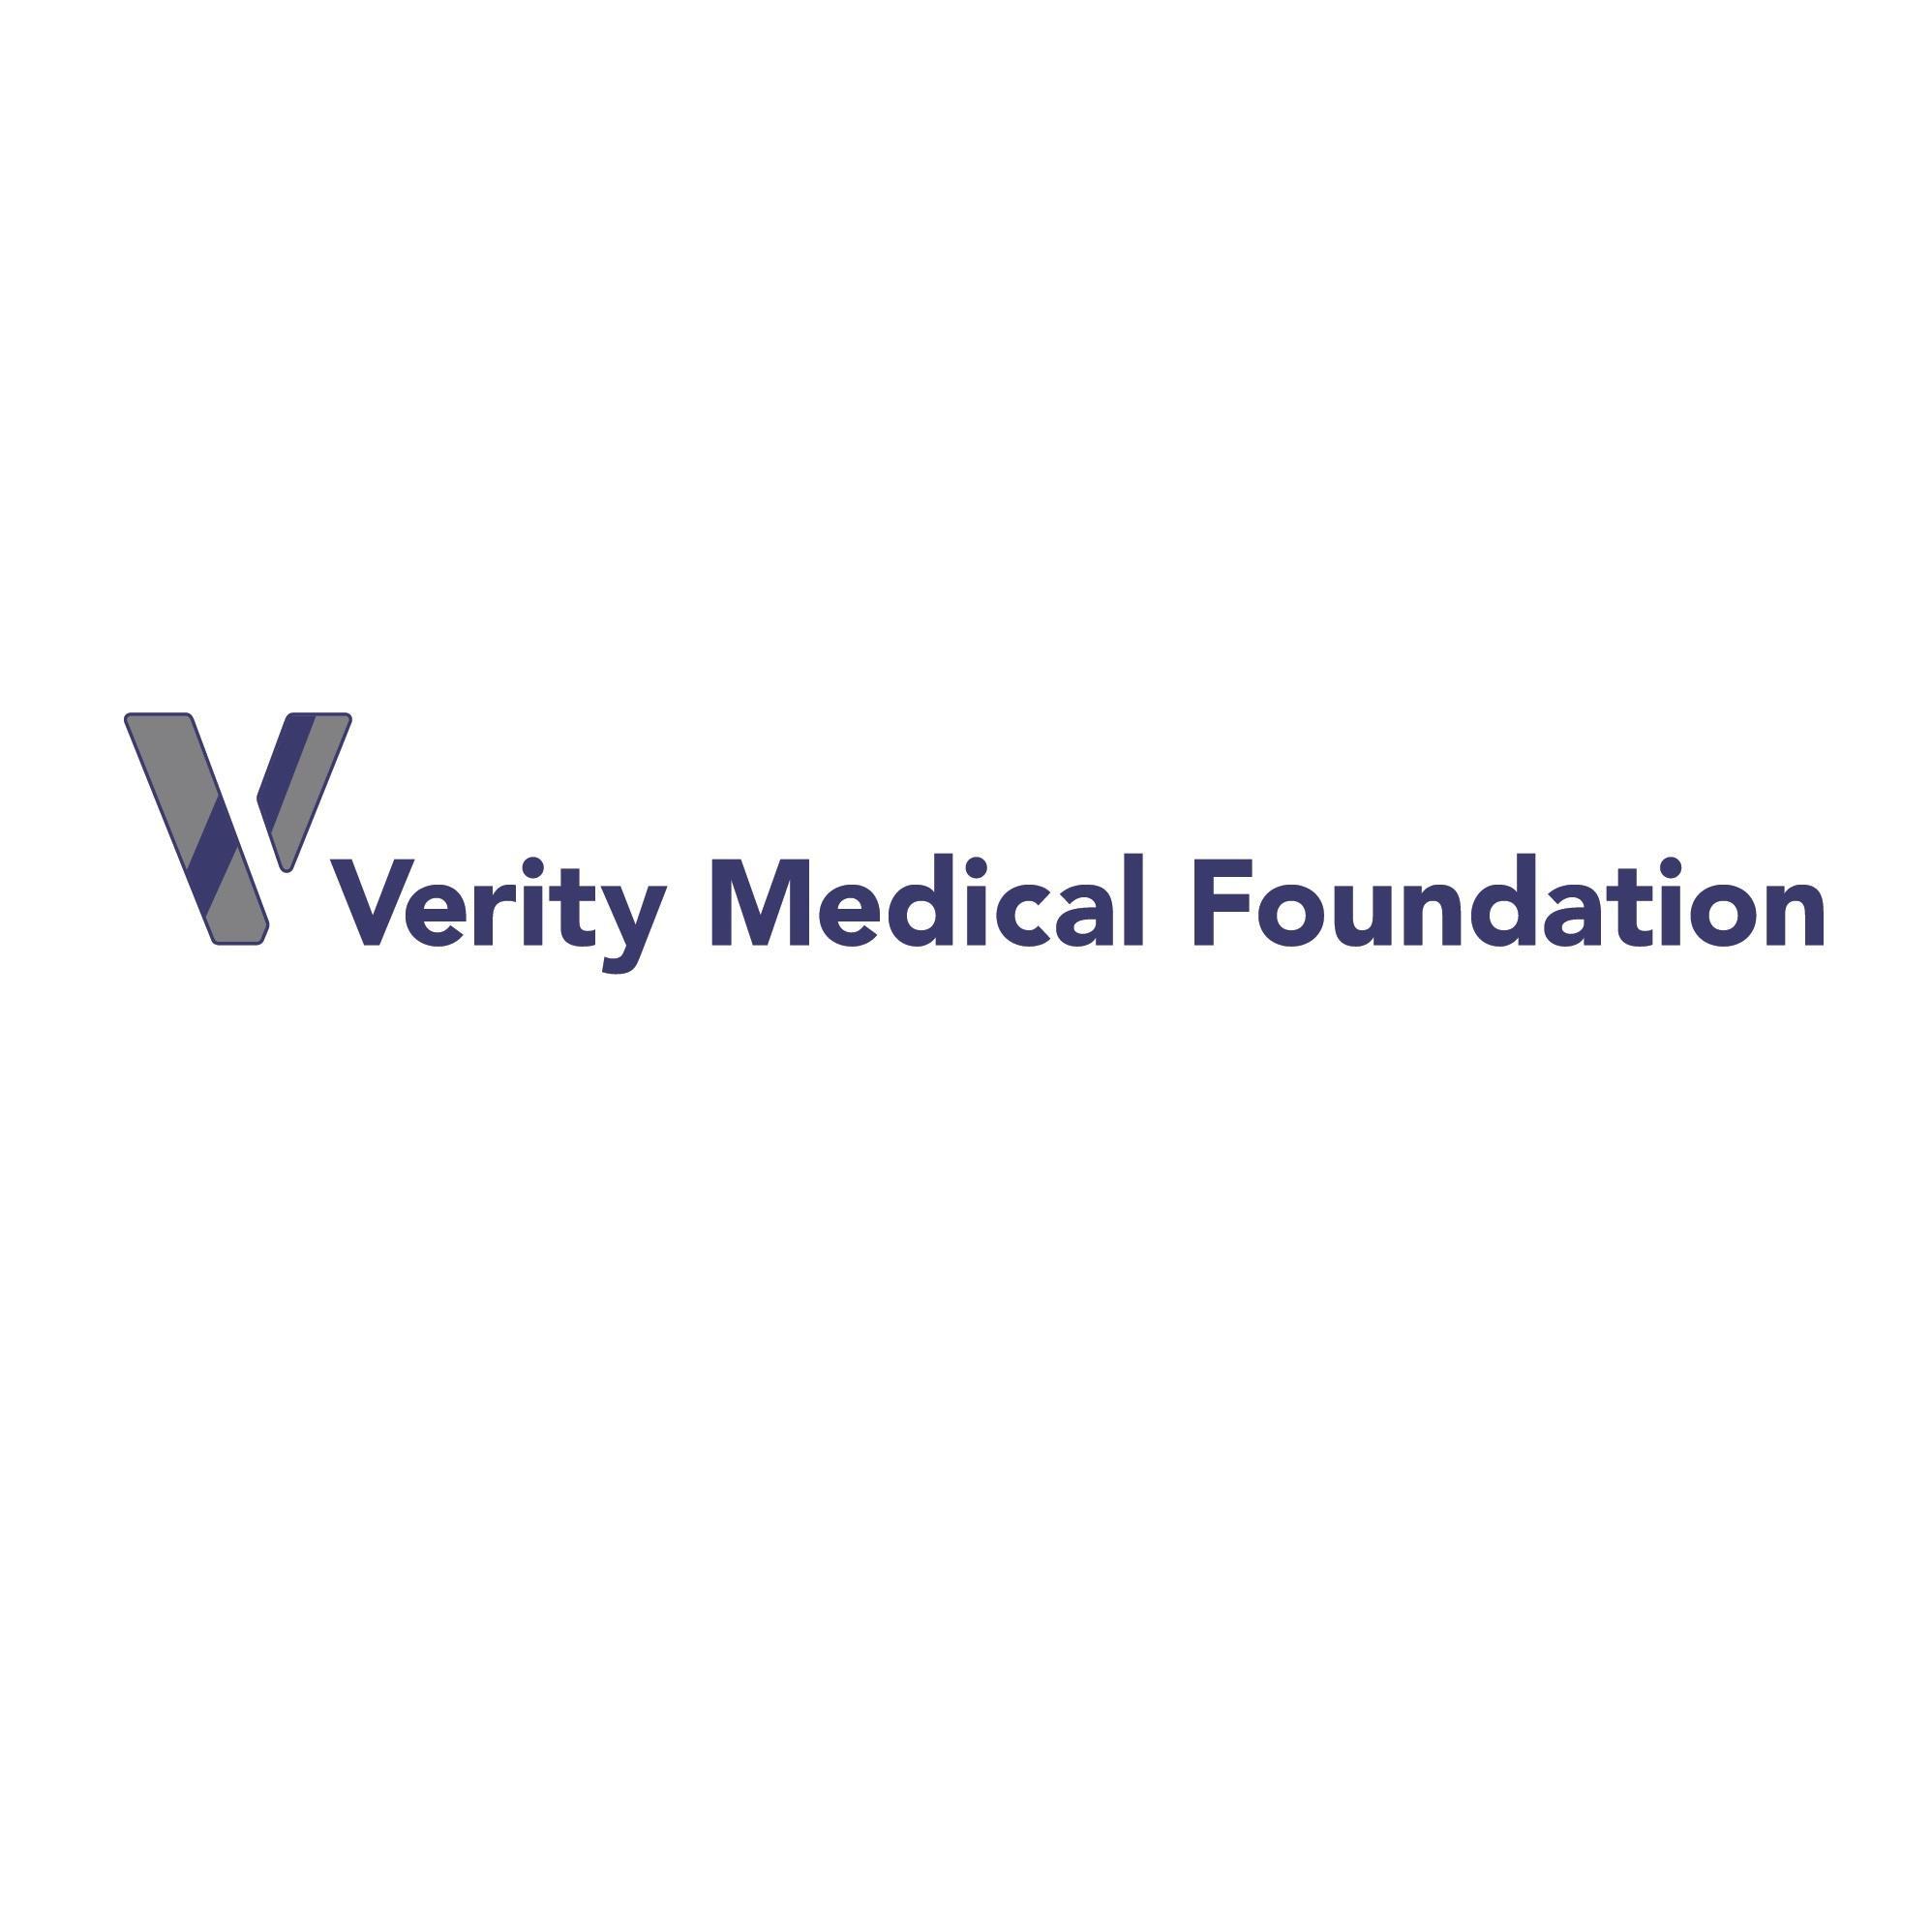 Verity Medical Foundation